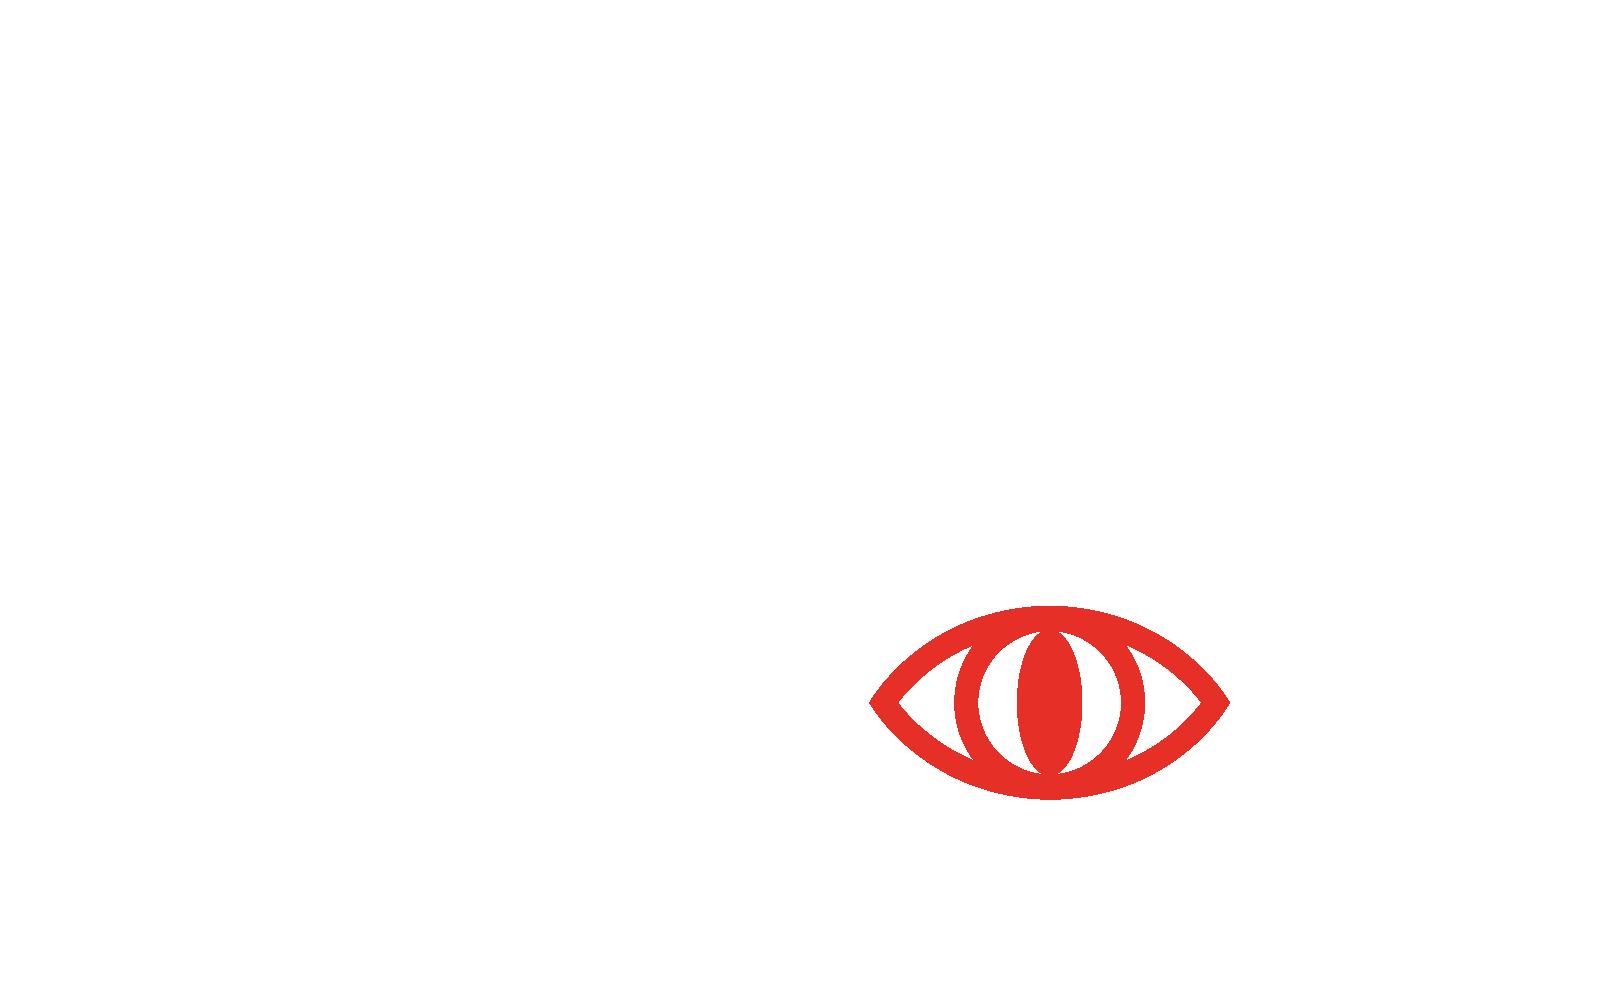 Easy_Tiger_BrandMark_RGB_White_Red.png